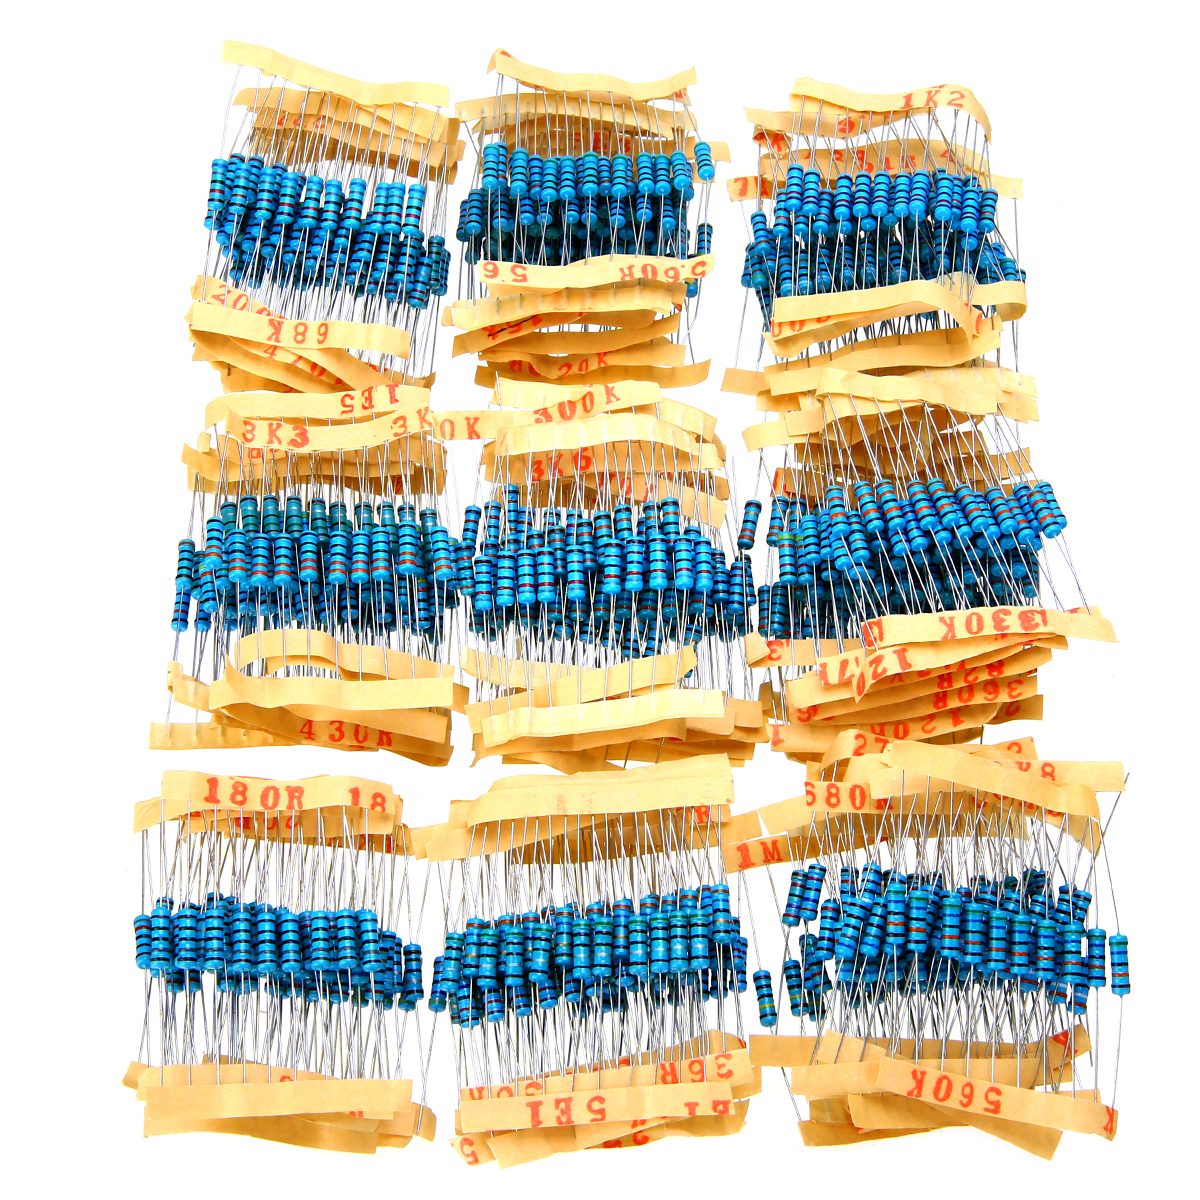 1000pcs 1% 1W Metal Film Resistor 100 Values Assorted Kit Set 1 Ohm~10M Ohm  Pack 100 Values Each 10pcs